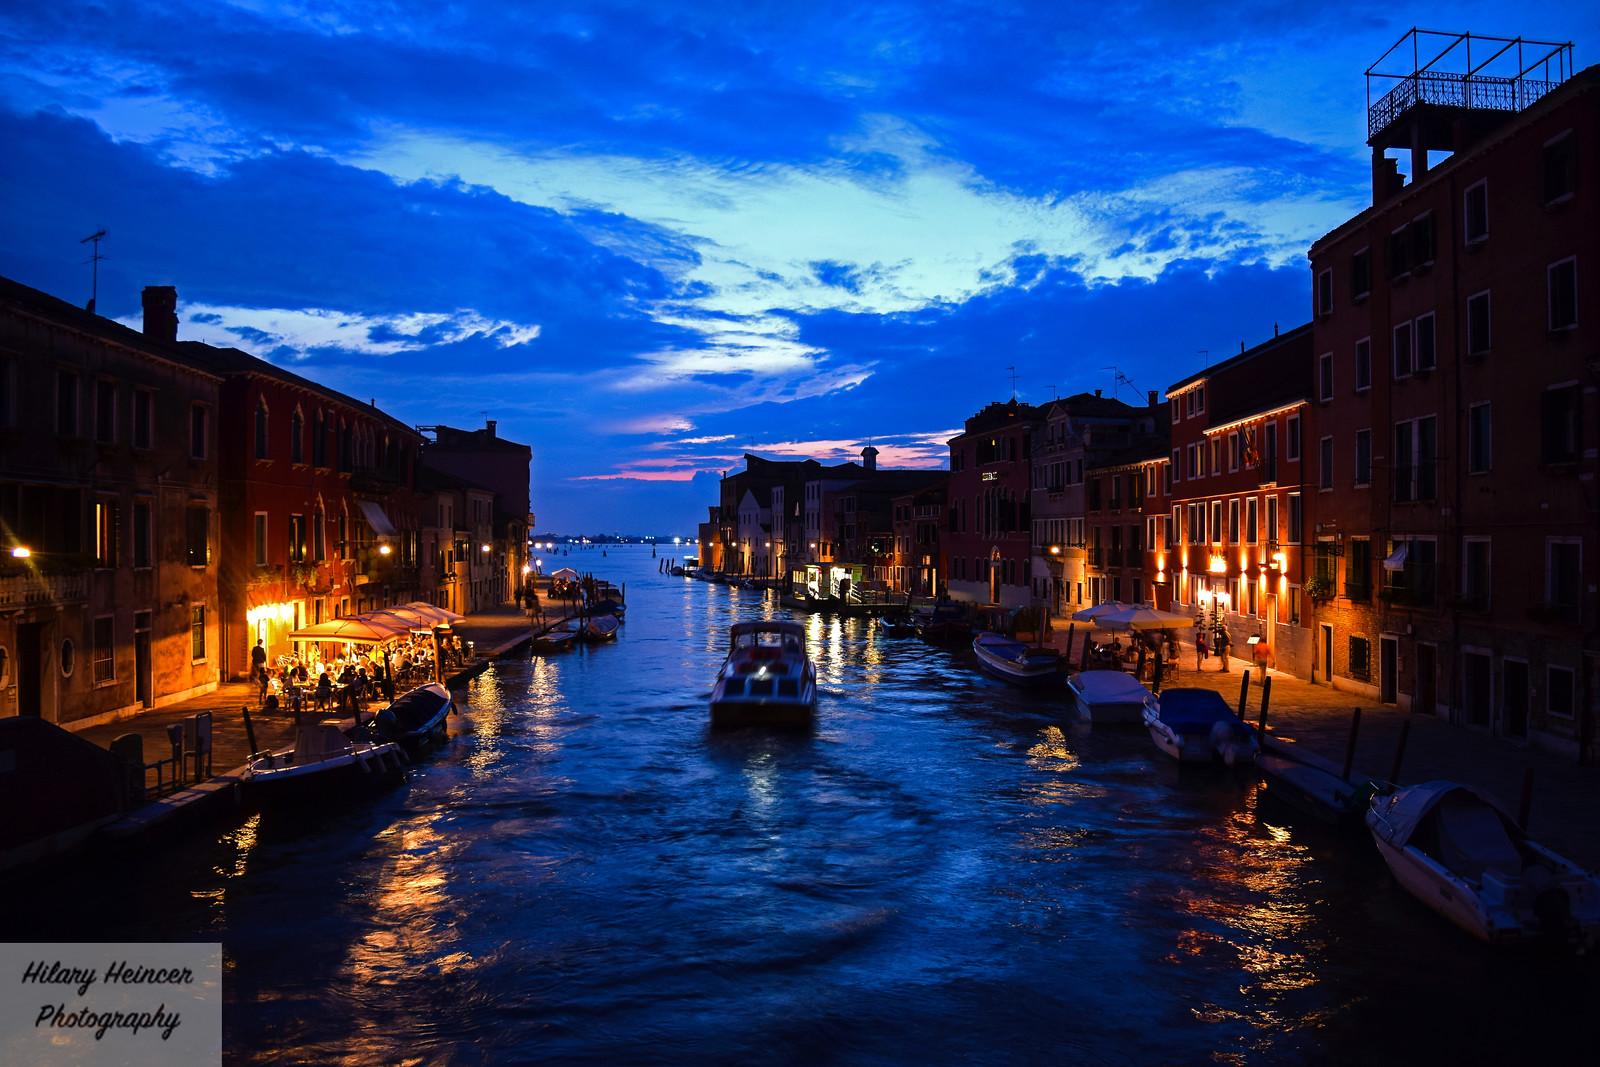 Nighttime in Venice 1